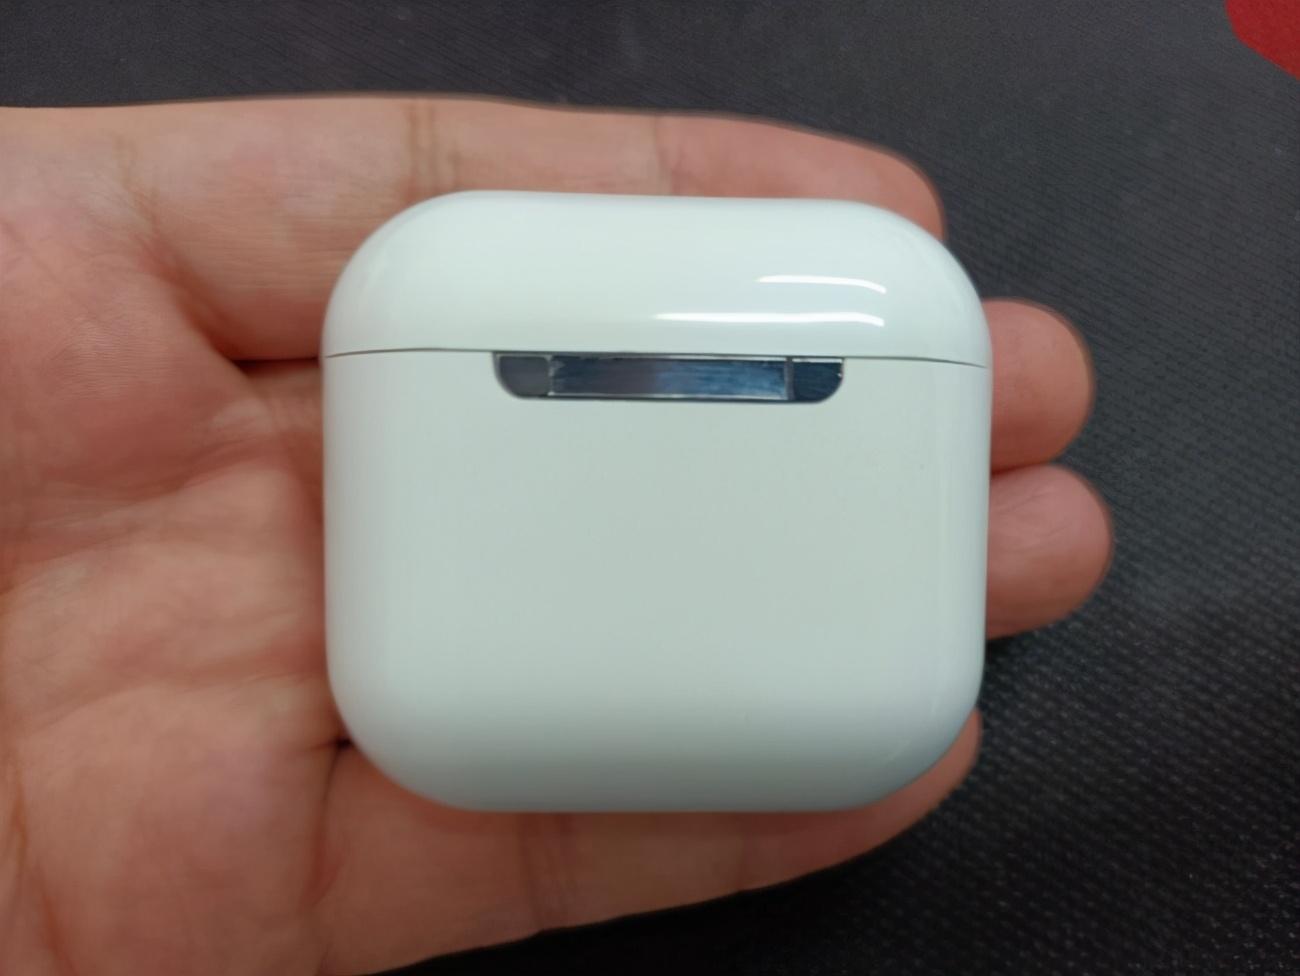 Xisem西圣Ava TWS蓝牙耳机 评测